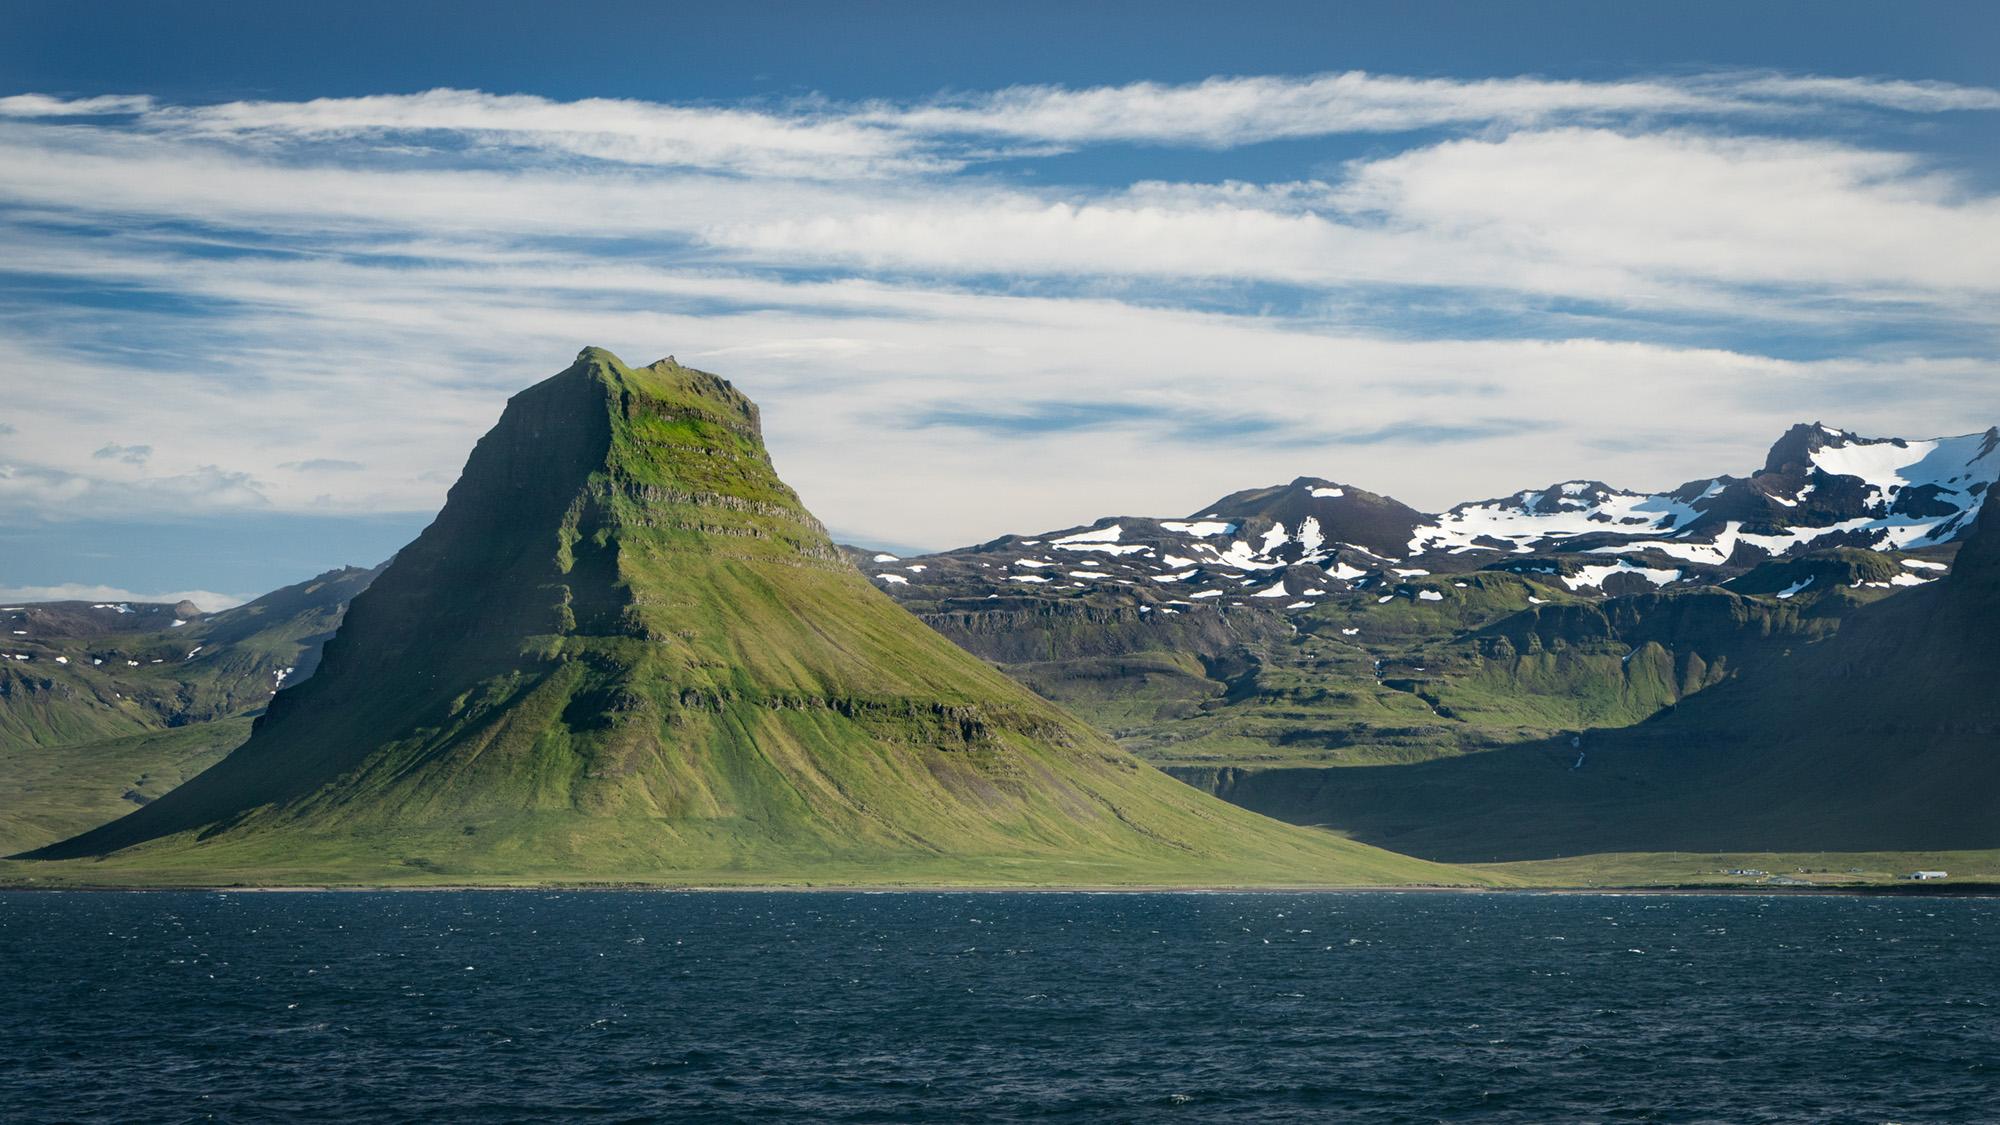 #iceland, #kirkjufell, #grundarfjordur, #landscape, #sony, #landscape, #mostphotographed #mountain